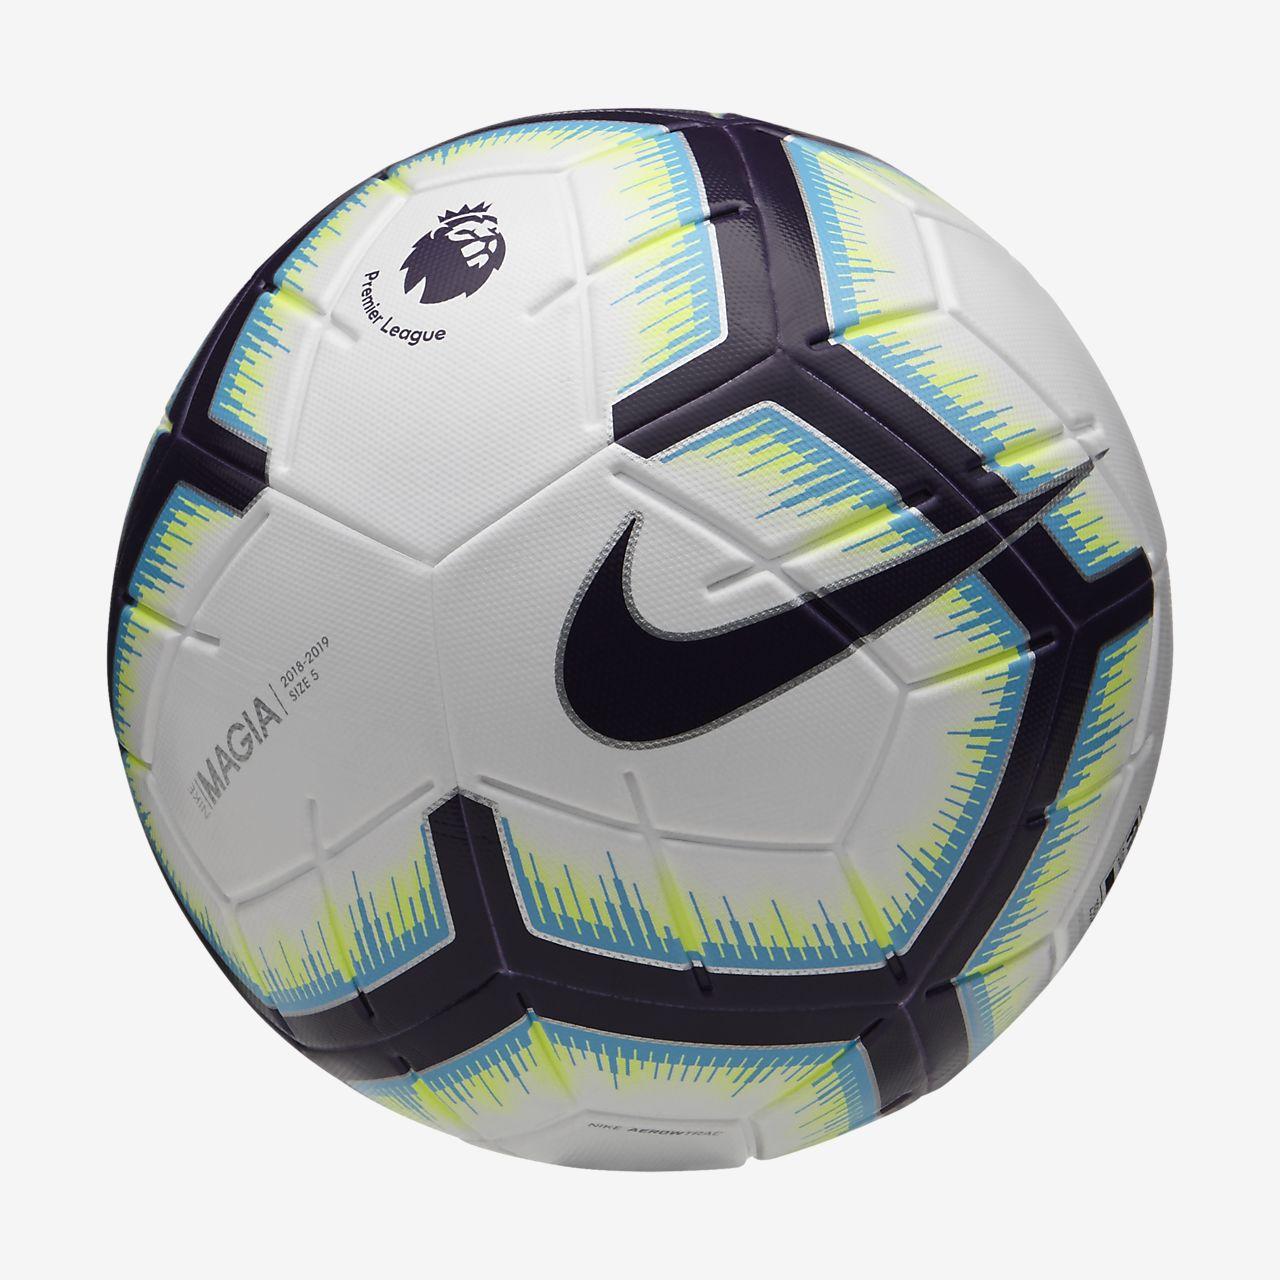 Bola de futebol Premier League Magia. Nike.com PT ddc33d7f9e3c7